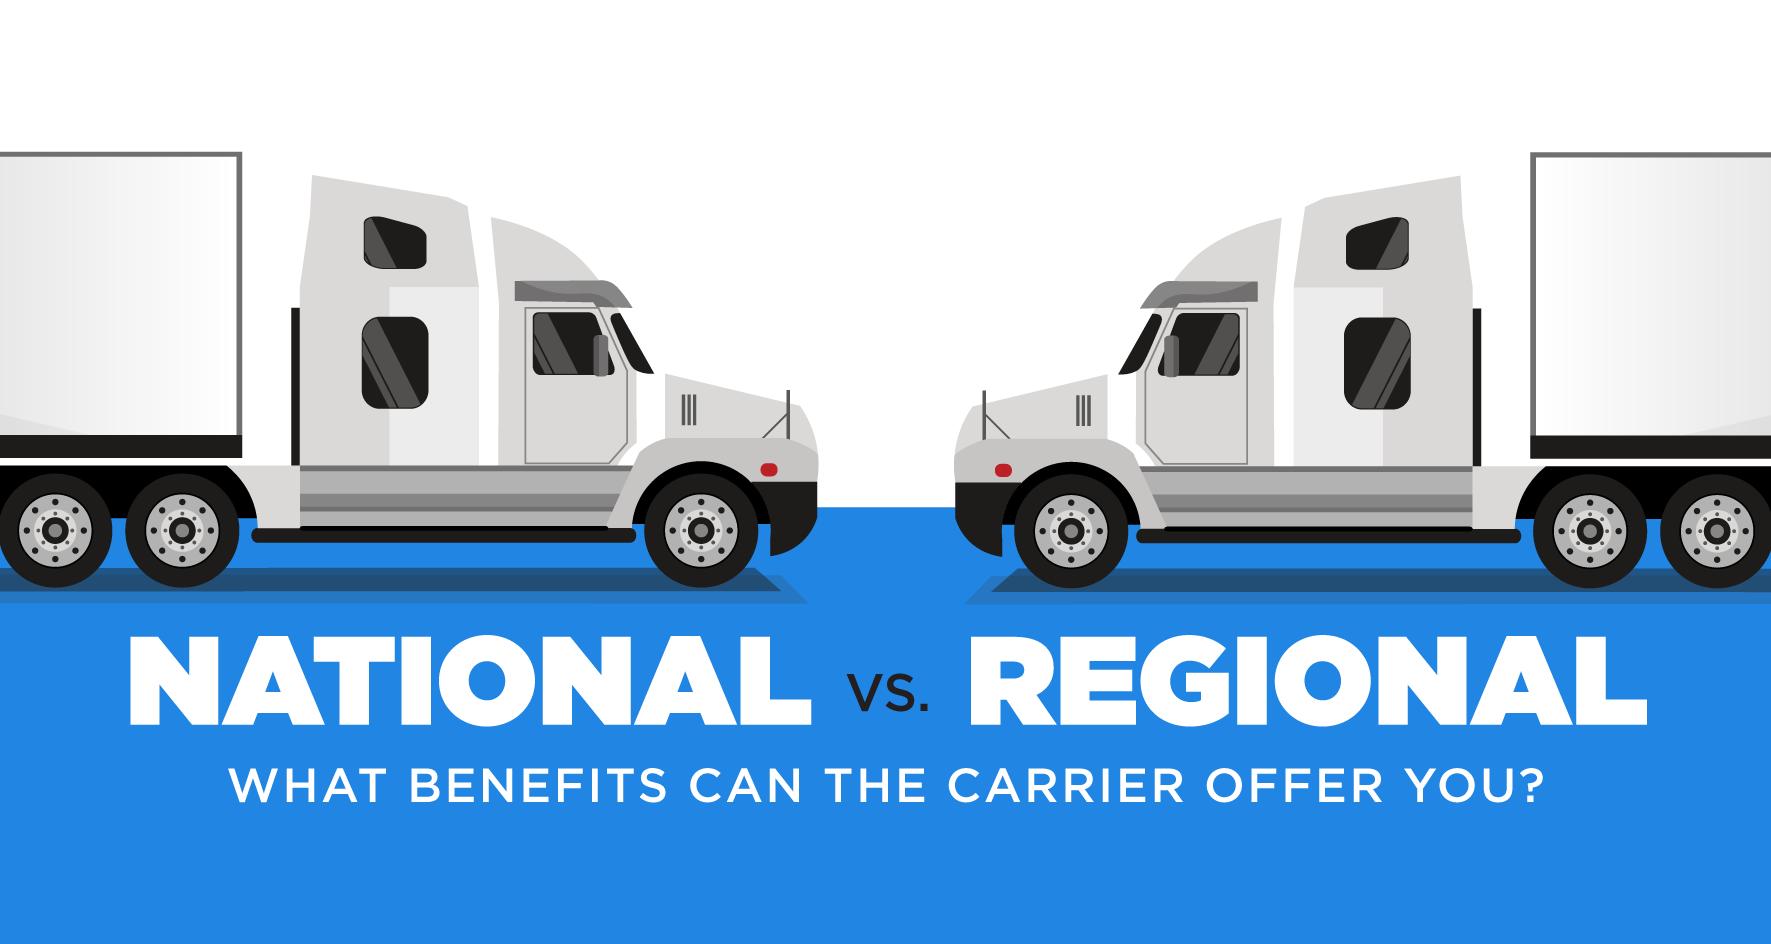 national carrier vs regional carrier benefits